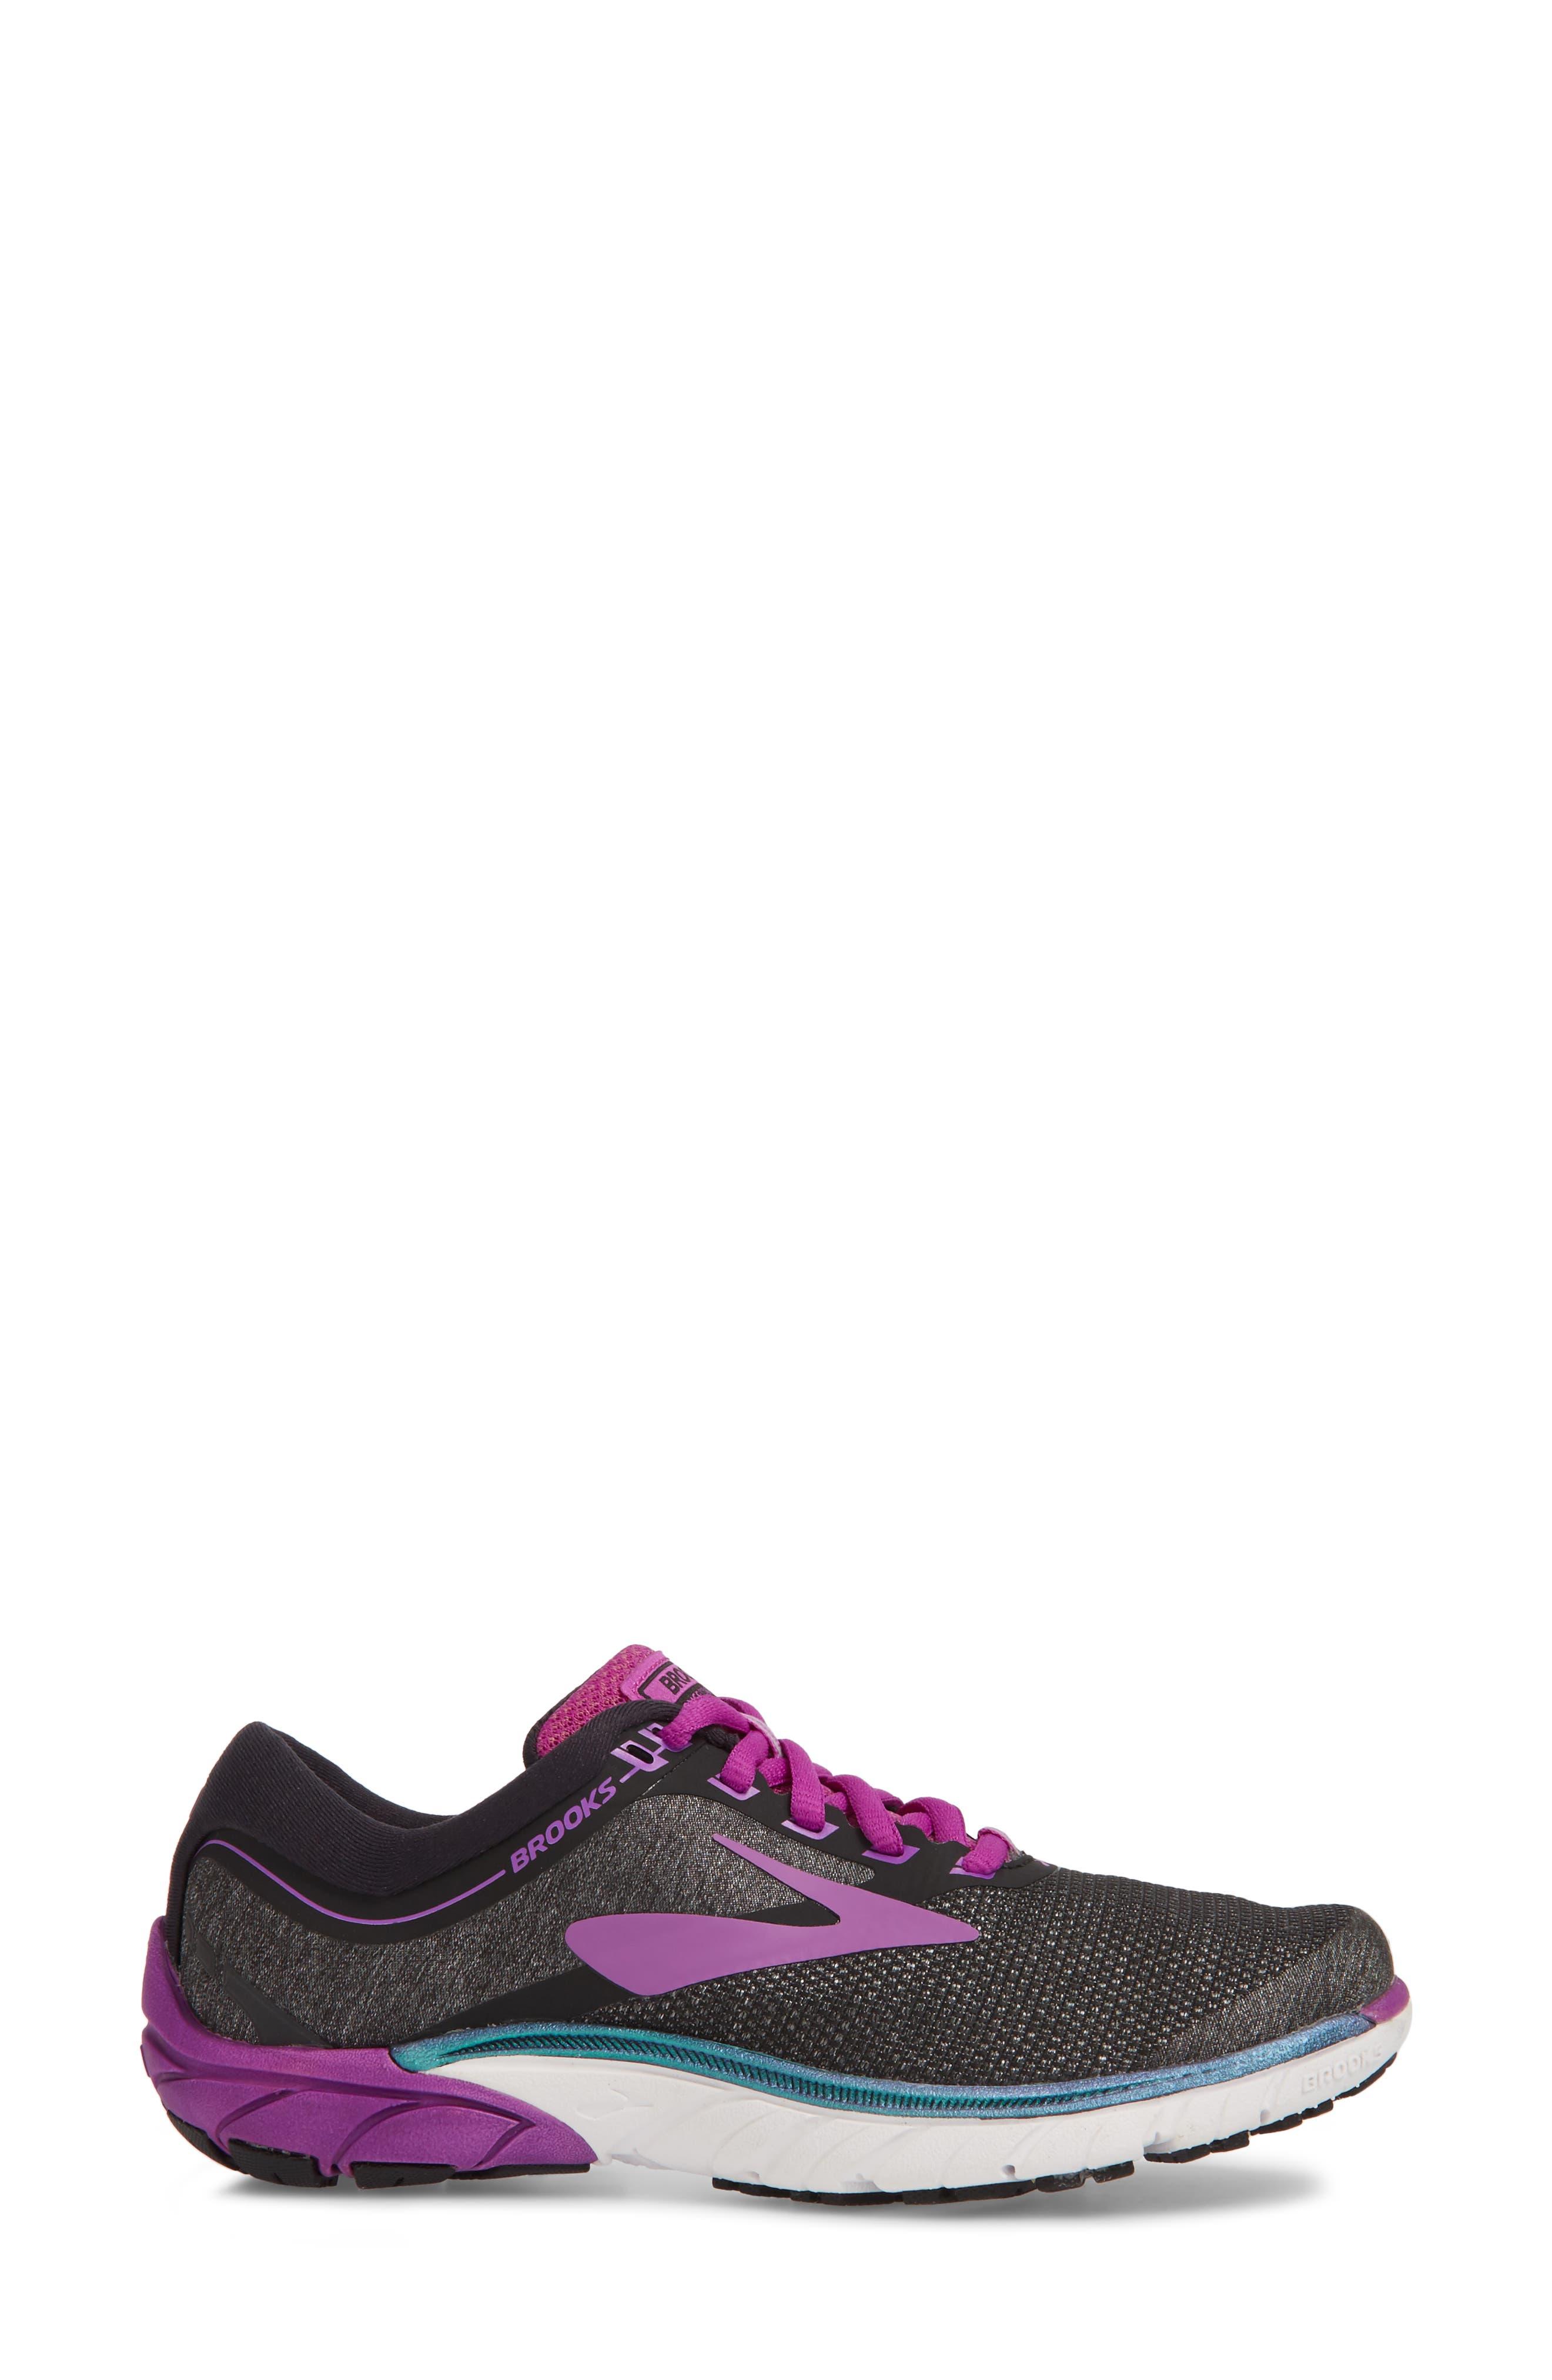 ,                             PureCadence 7 Road Running Shoe,                             Alternate thumbnail 3, color,                             BLACK/ PURPLE/ MULTI